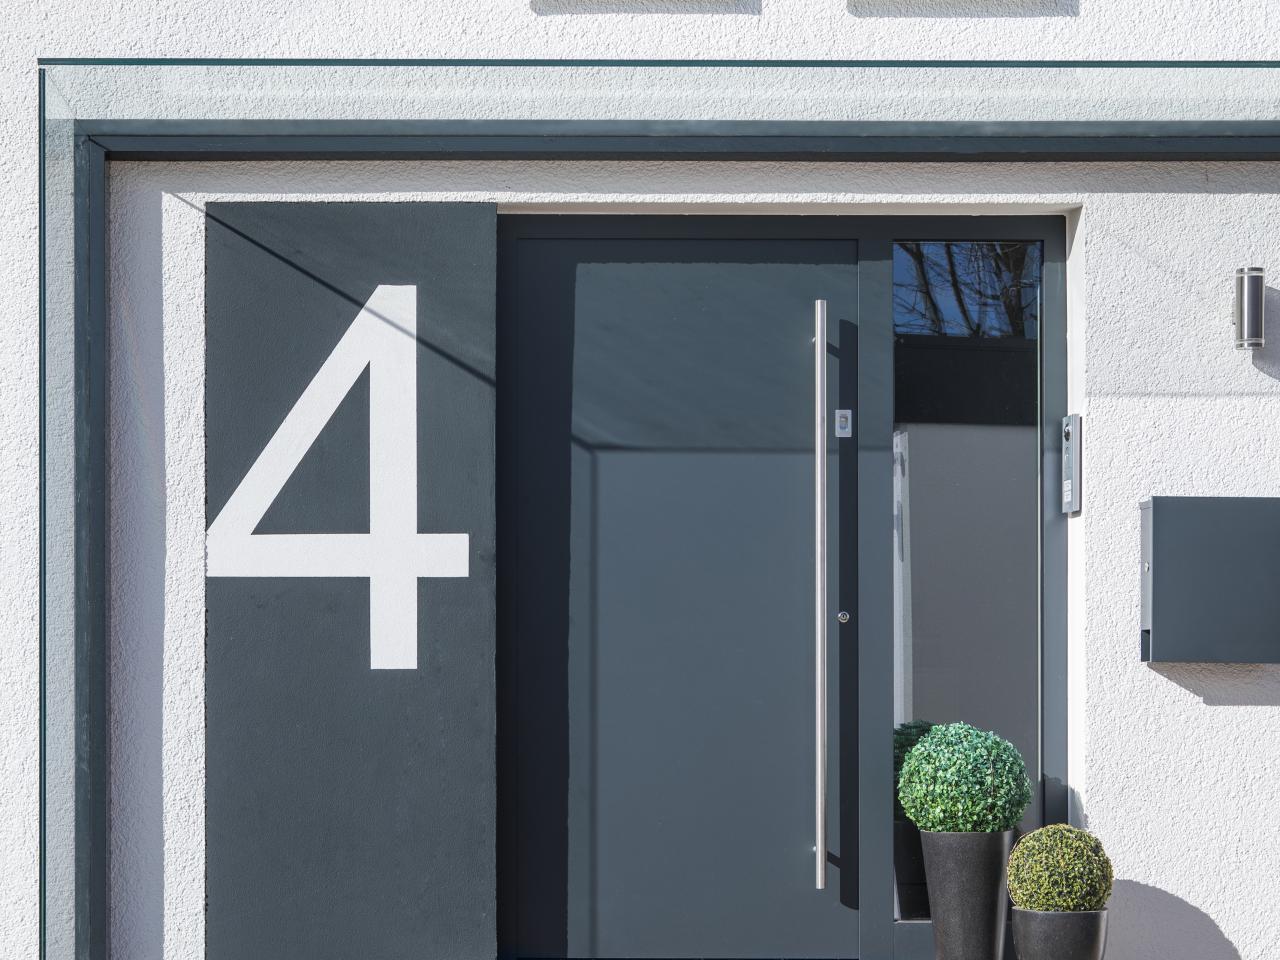 vord cher aus glas nach ma glasvordach glasprofi24. Black Bedroom Furniture Sets. Home Design Ideas